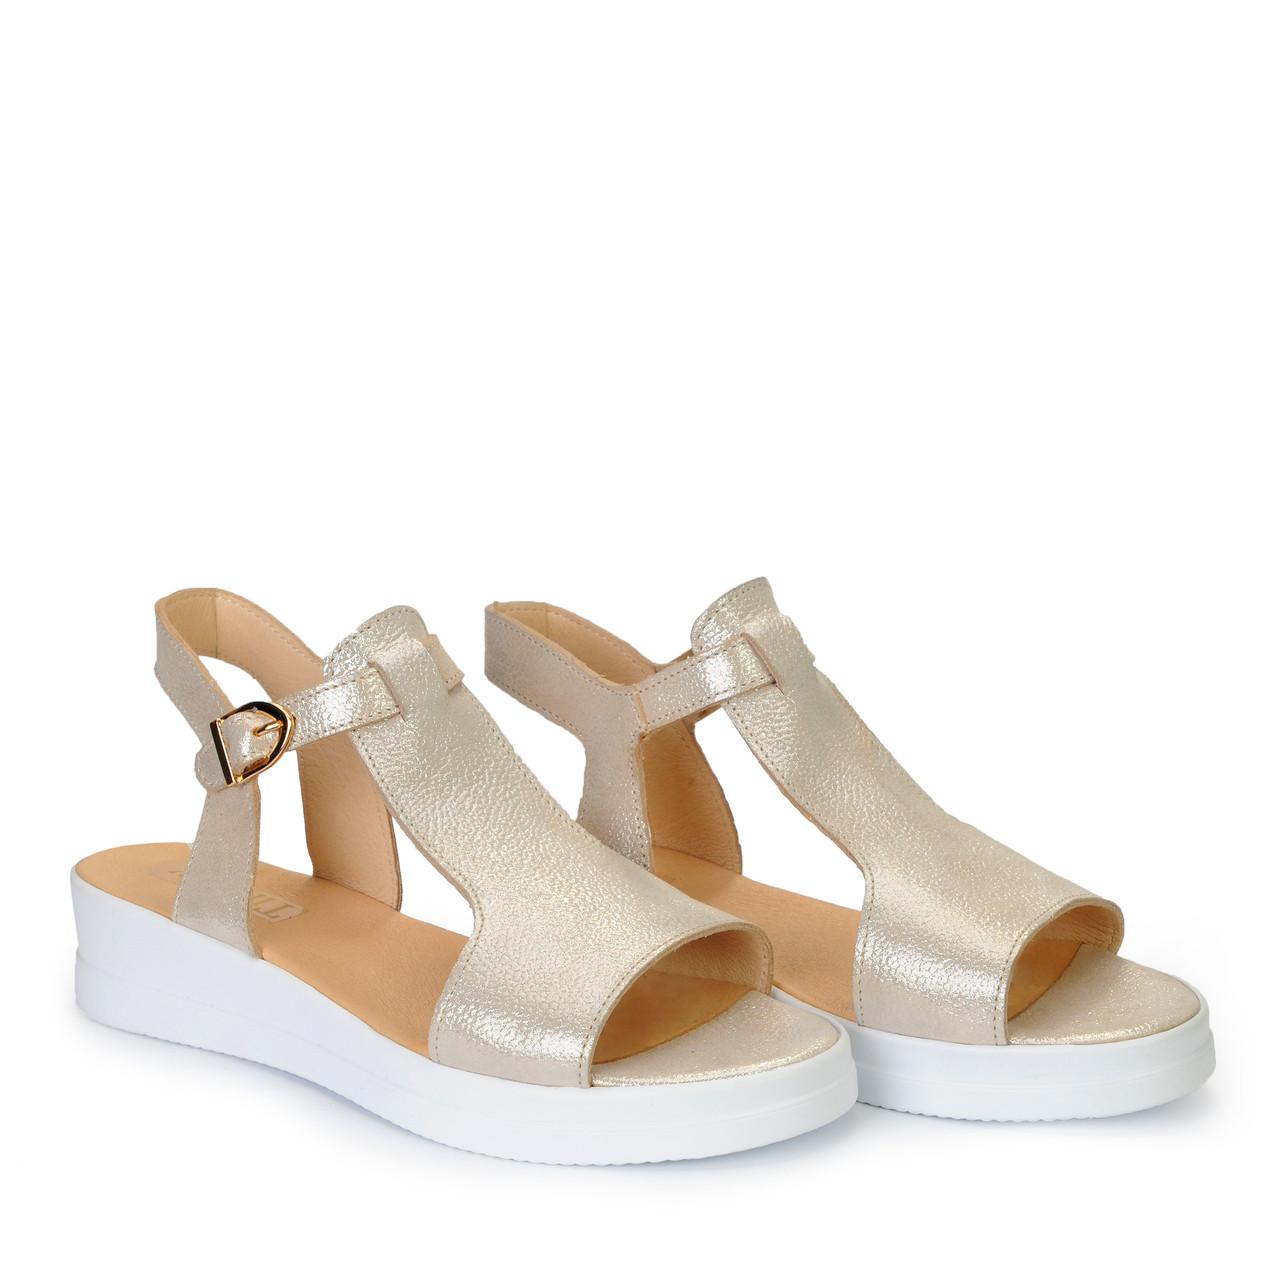 ba22e18bb16 Женские кожаные туфли босоножки сандалии на танкетке платформе TIFFANY:  продажа, ...